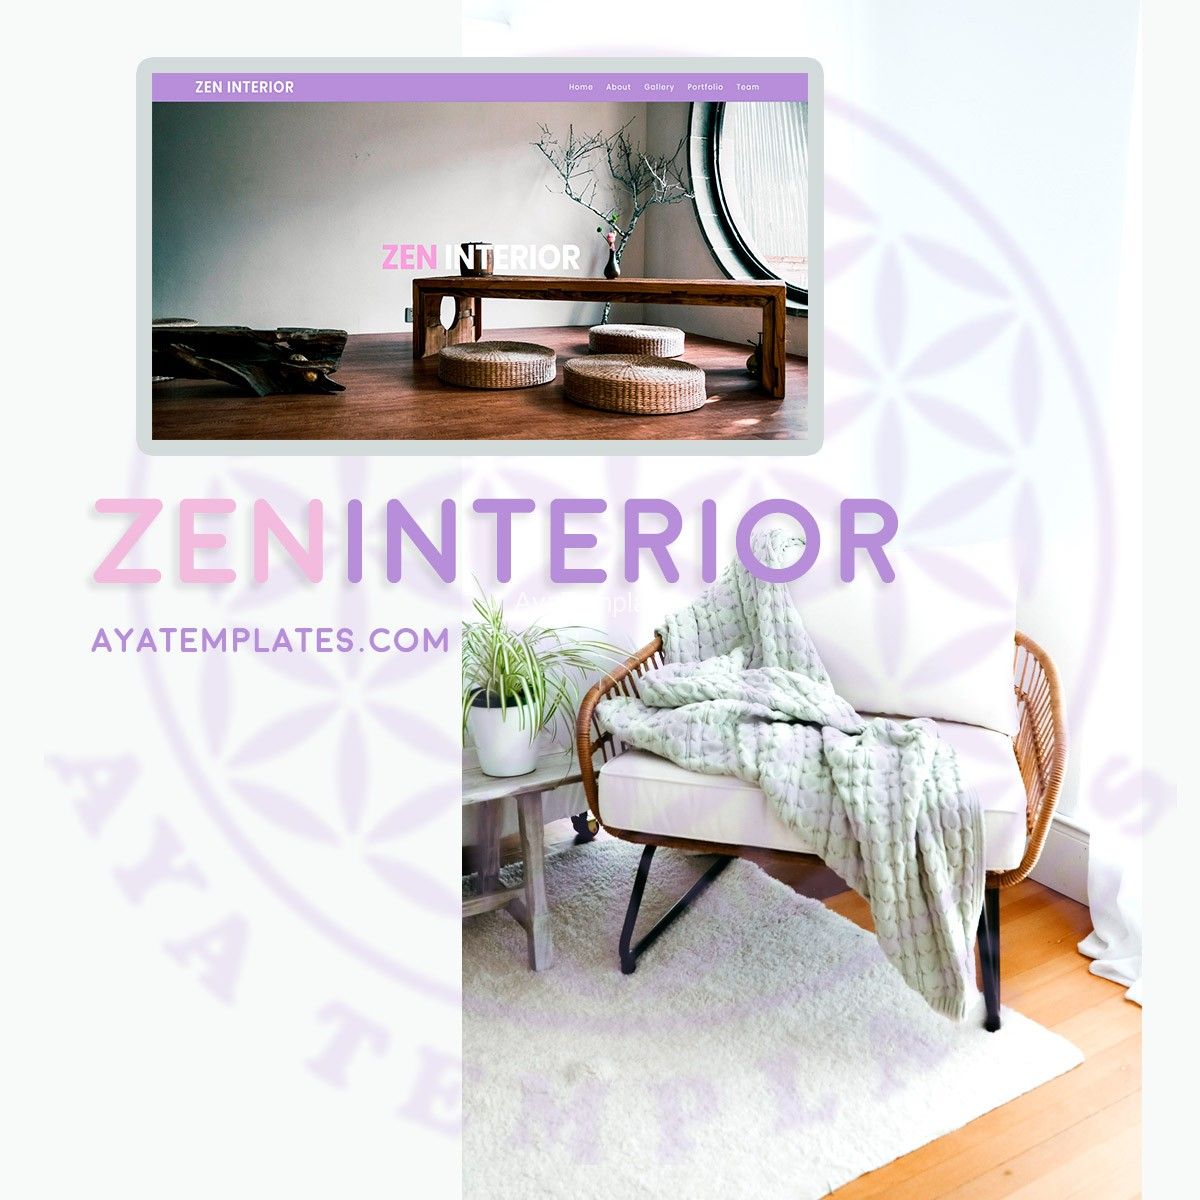 ZenInterior---HTML5-CSS3---one-page-website---mockup---ayatemplates